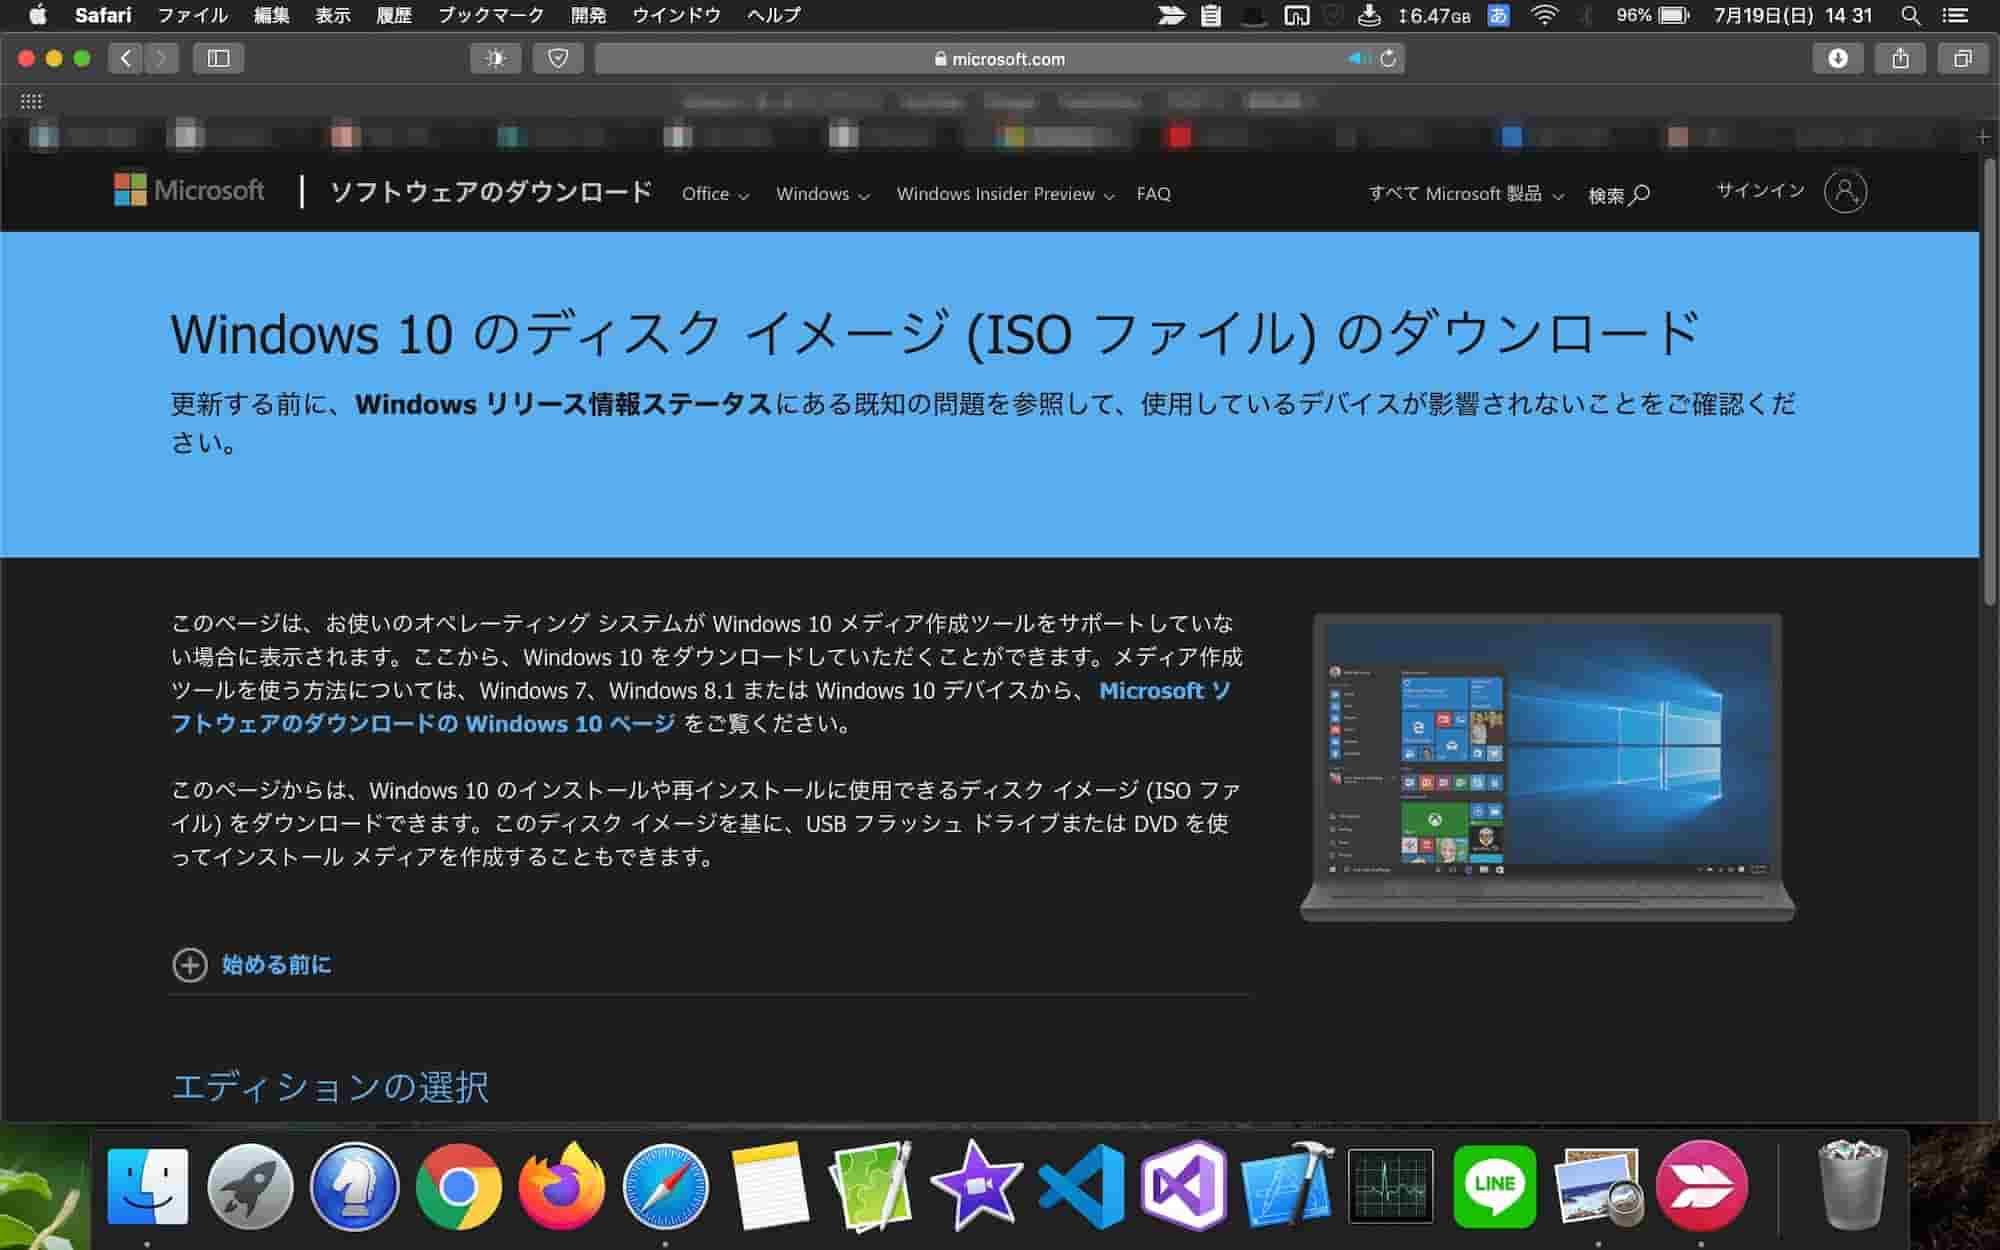 windows isoイメージ